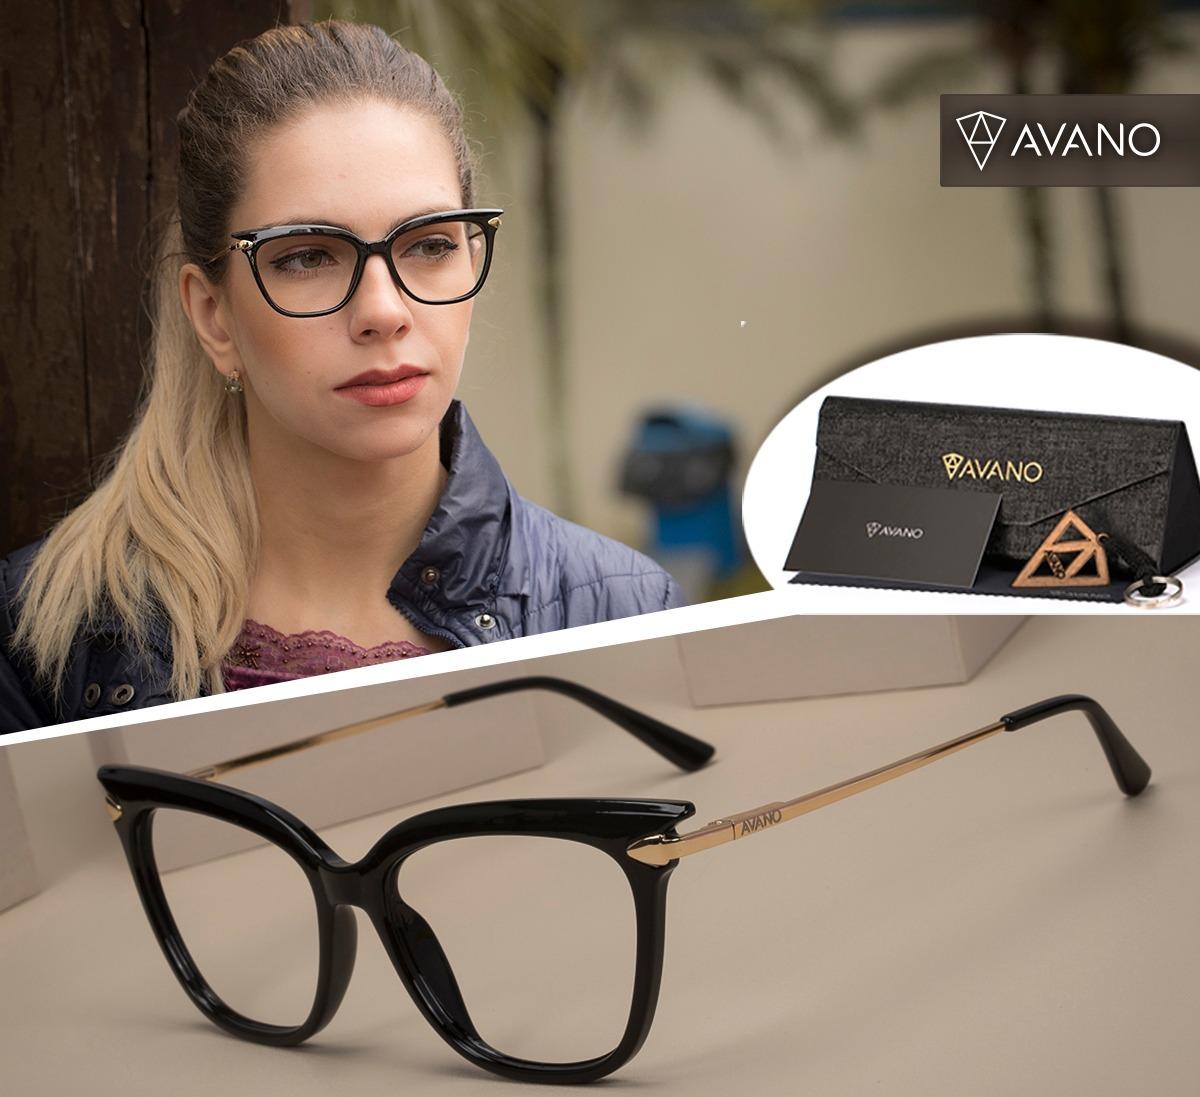 b9d8eb1d7 Armação Oculos Grau Avano Av 238-c Feminino C/ Case Flanela - R$ 59 ...